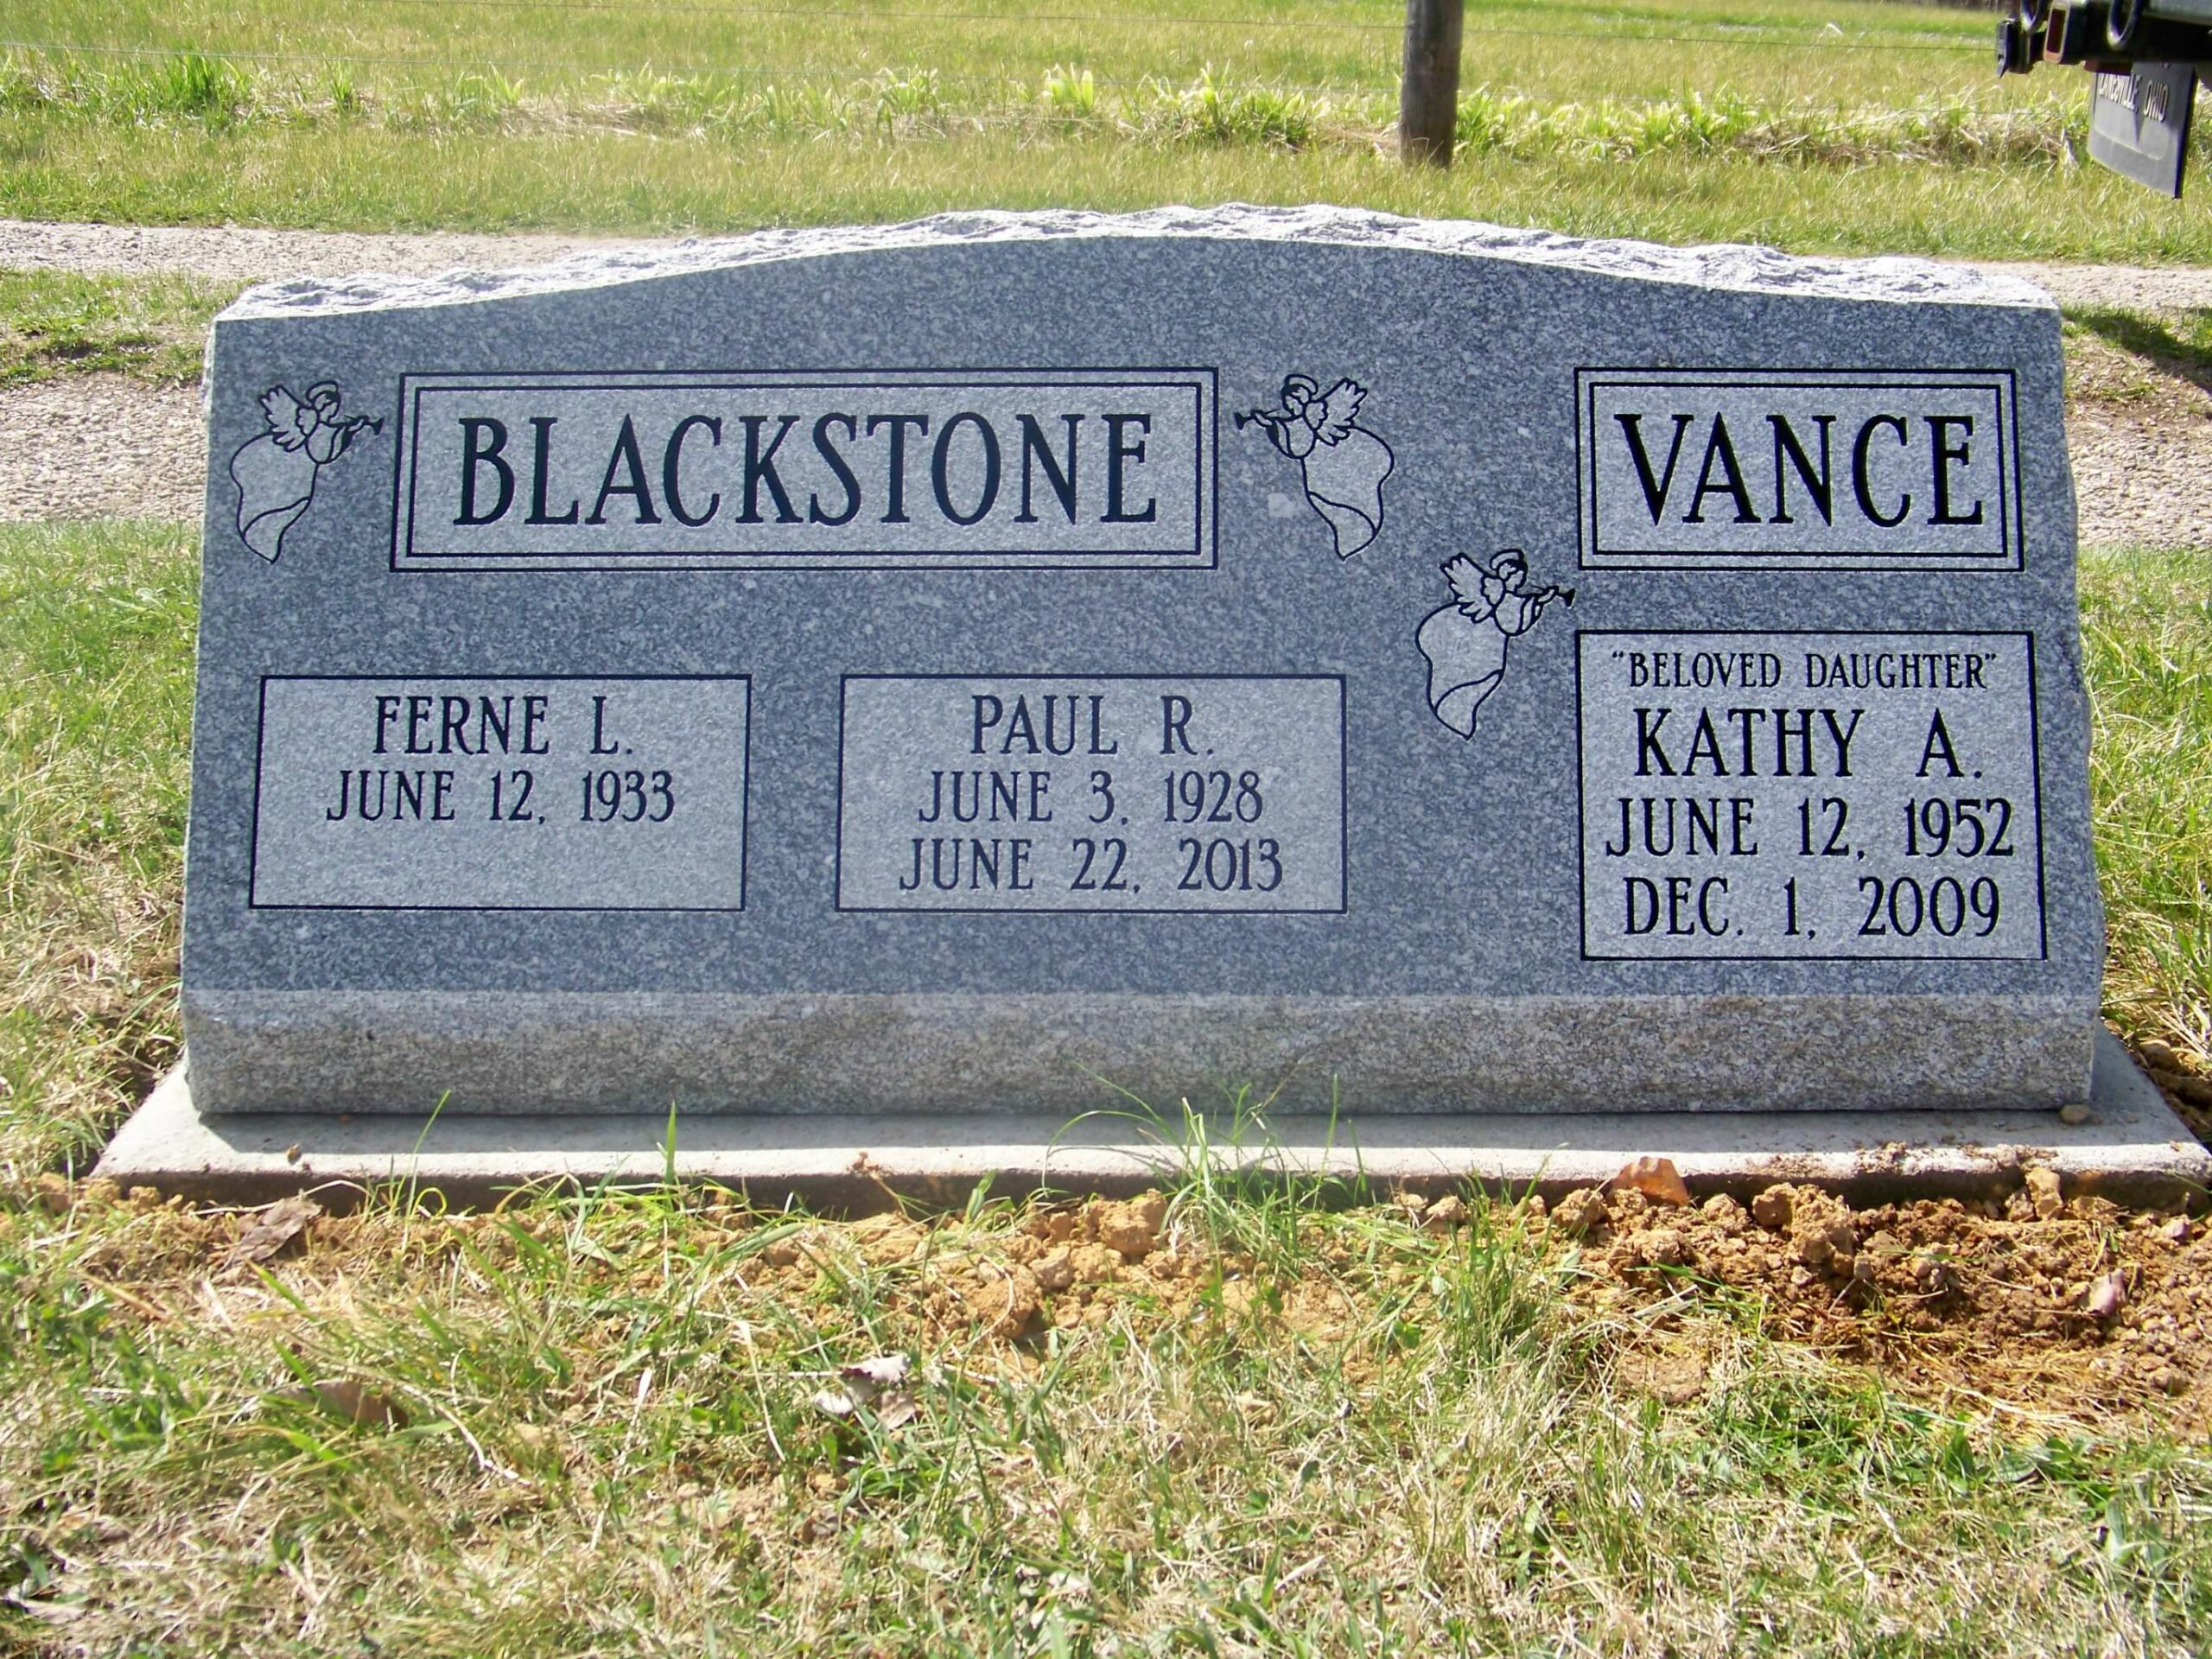 Blackstone, Rerne, Paul